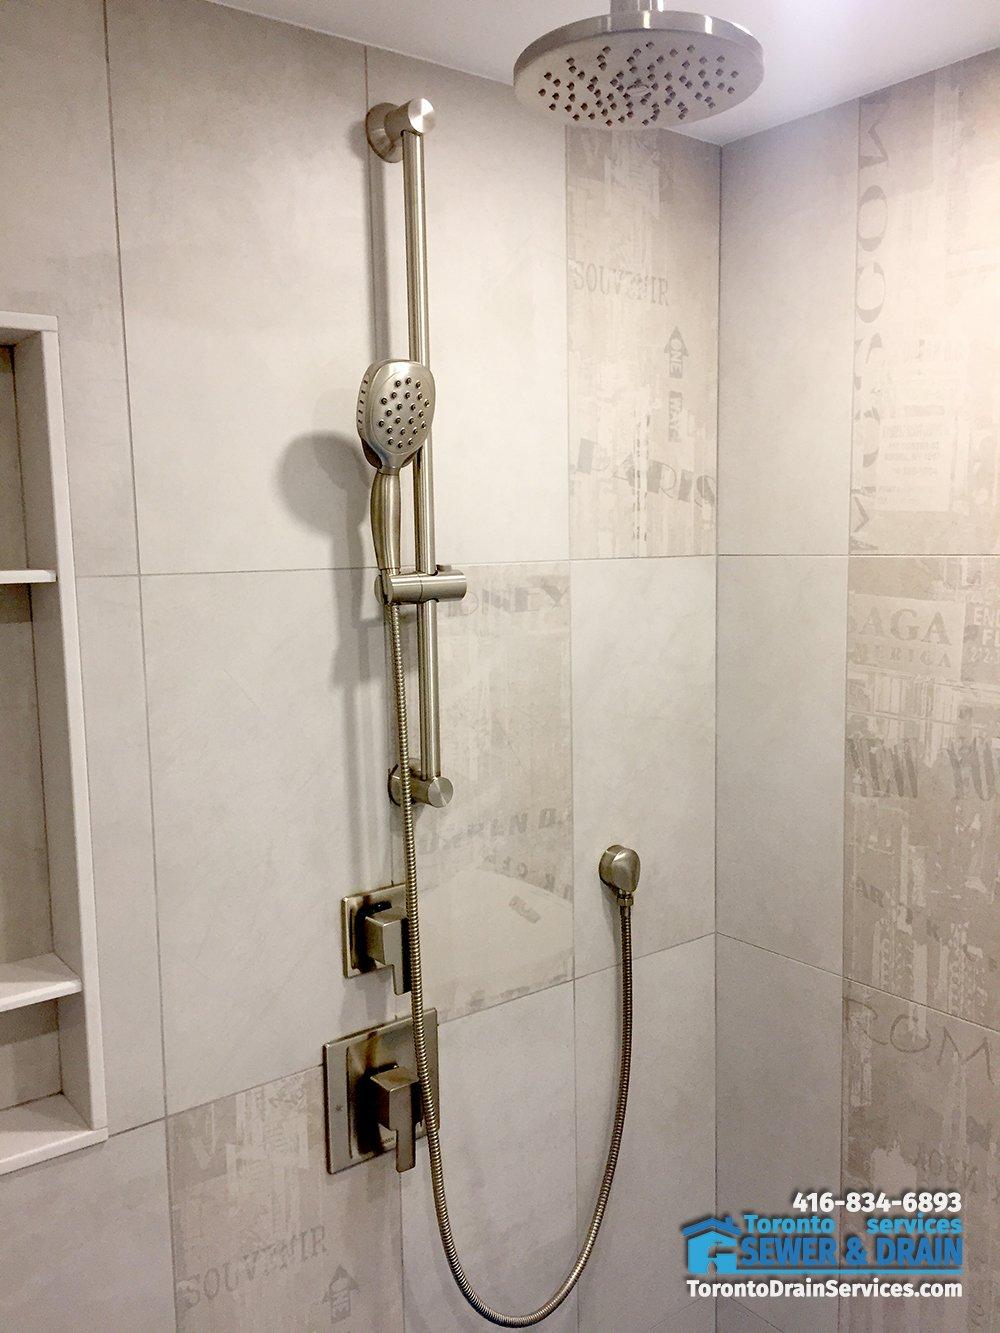 Modern shower faucet installation in Toronto basement